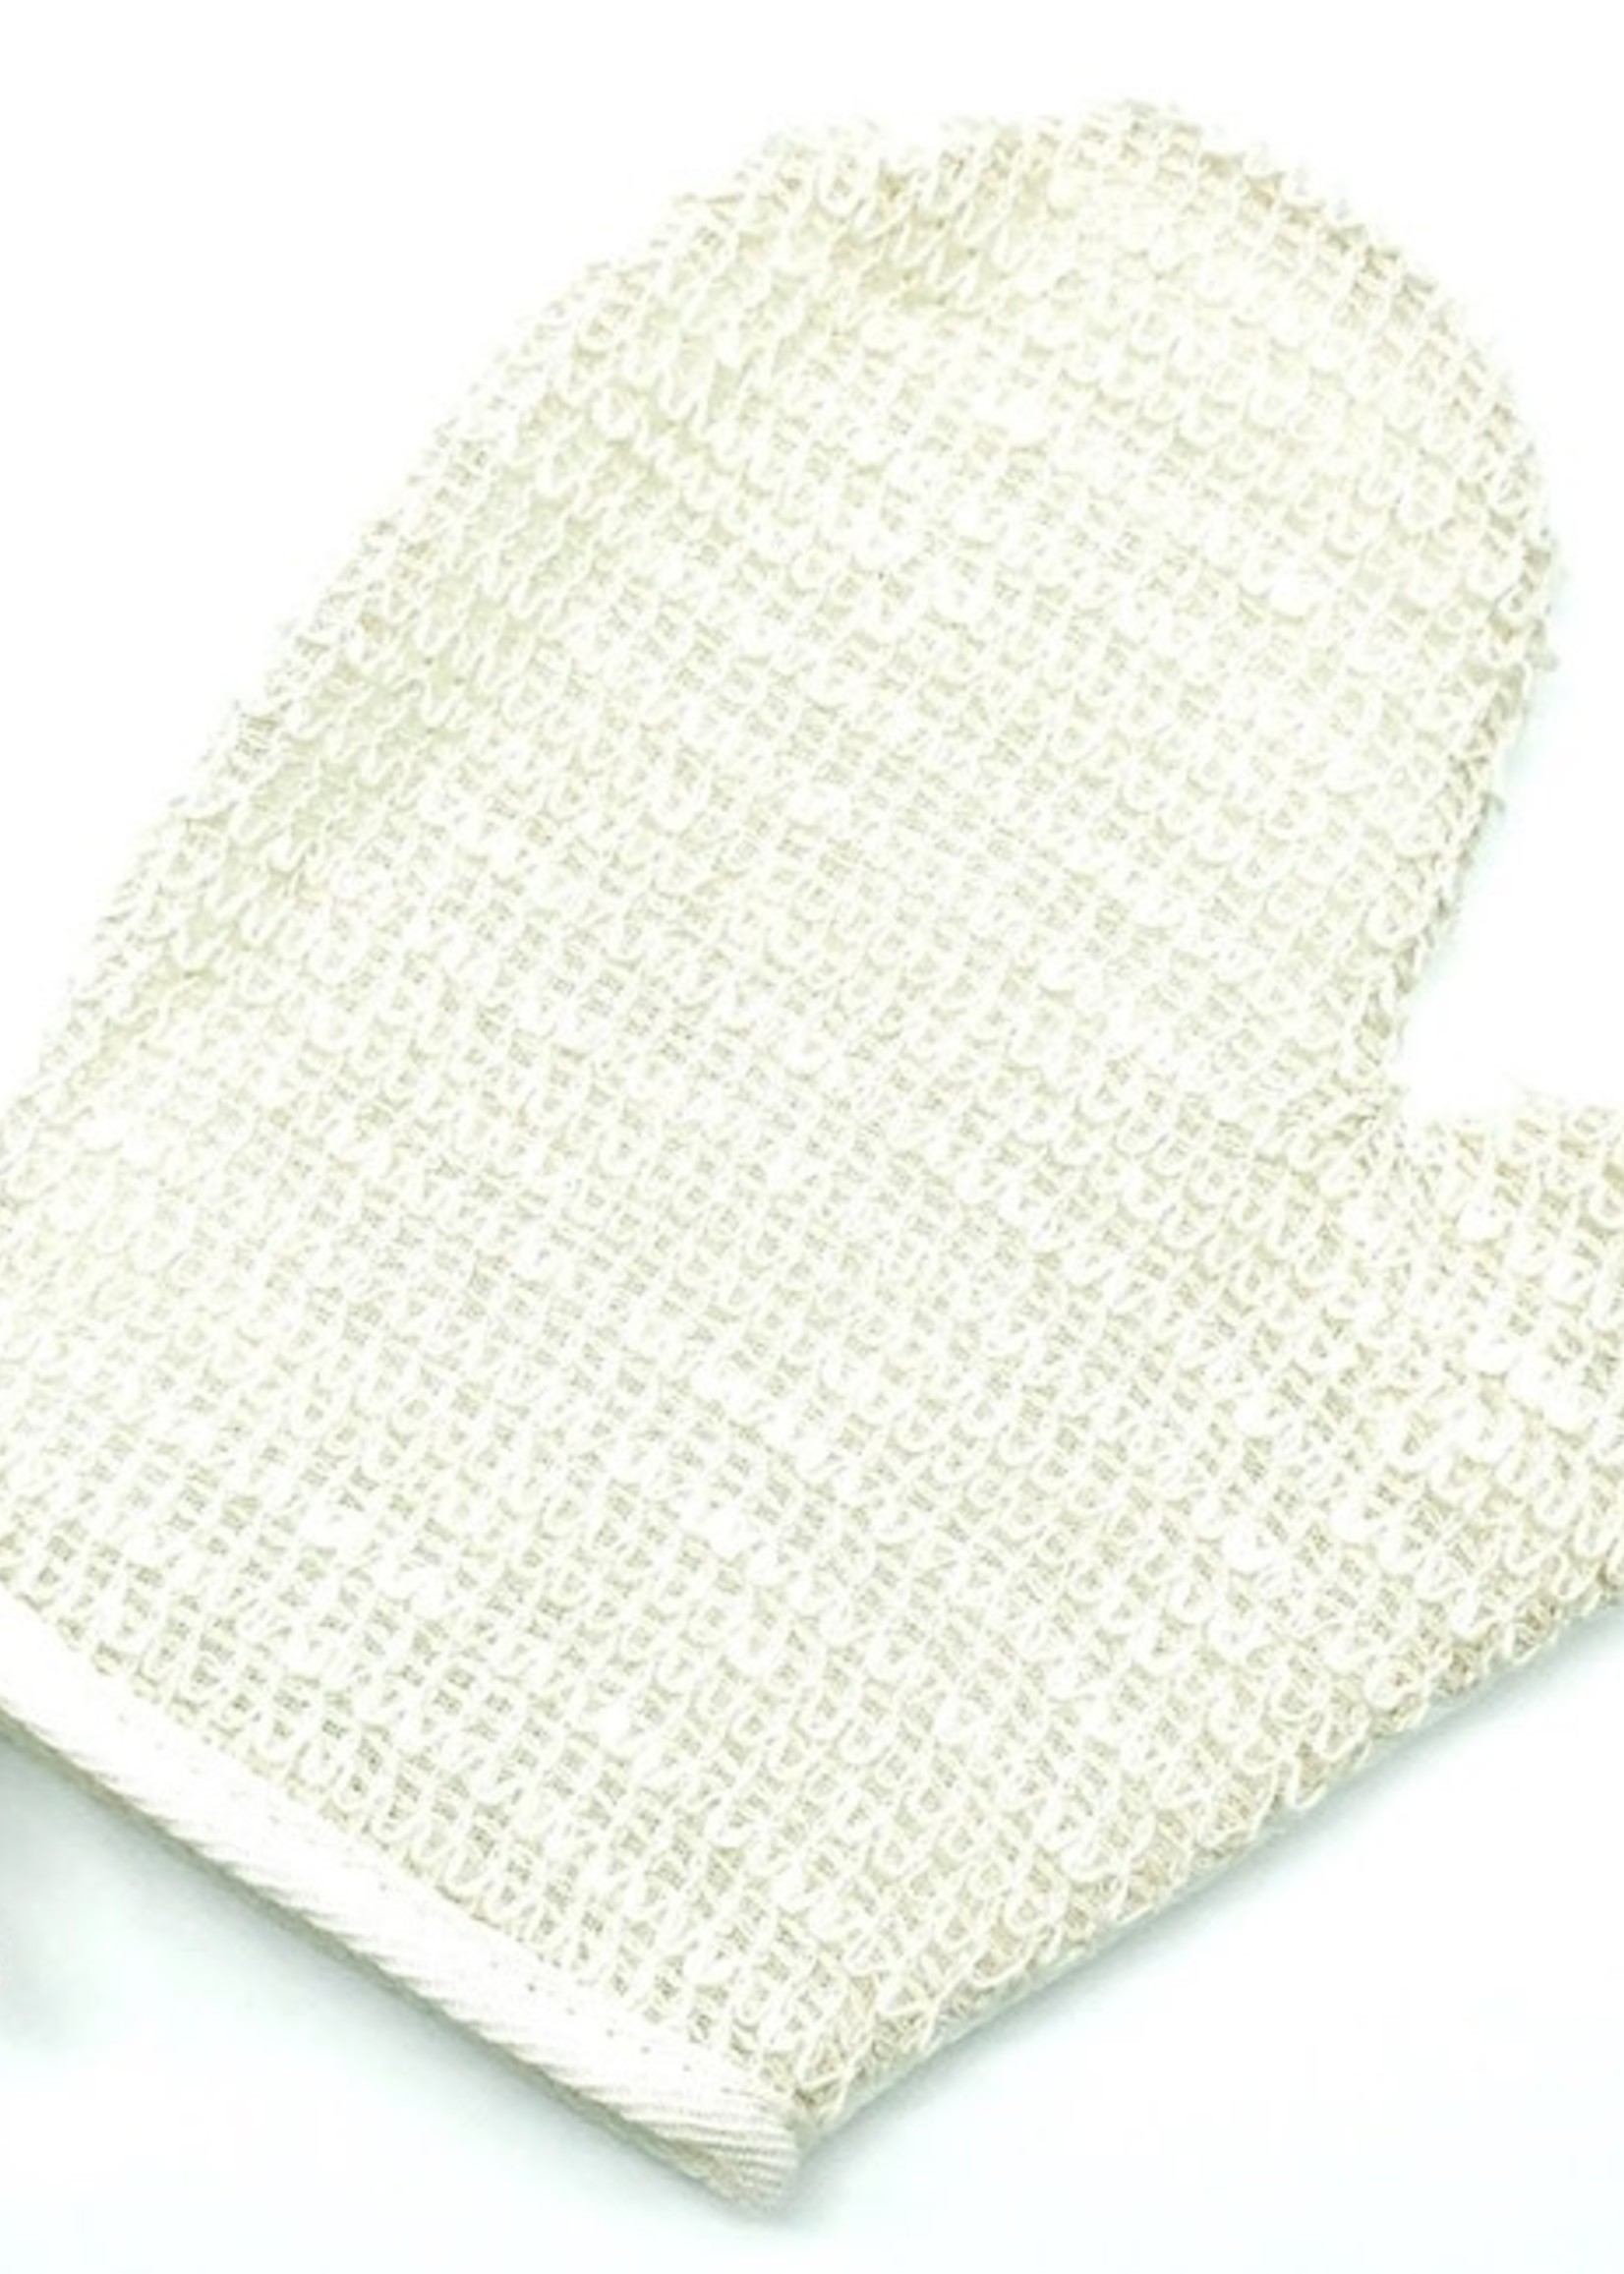 Bamboo Switch Sisal Exfoliating Glove